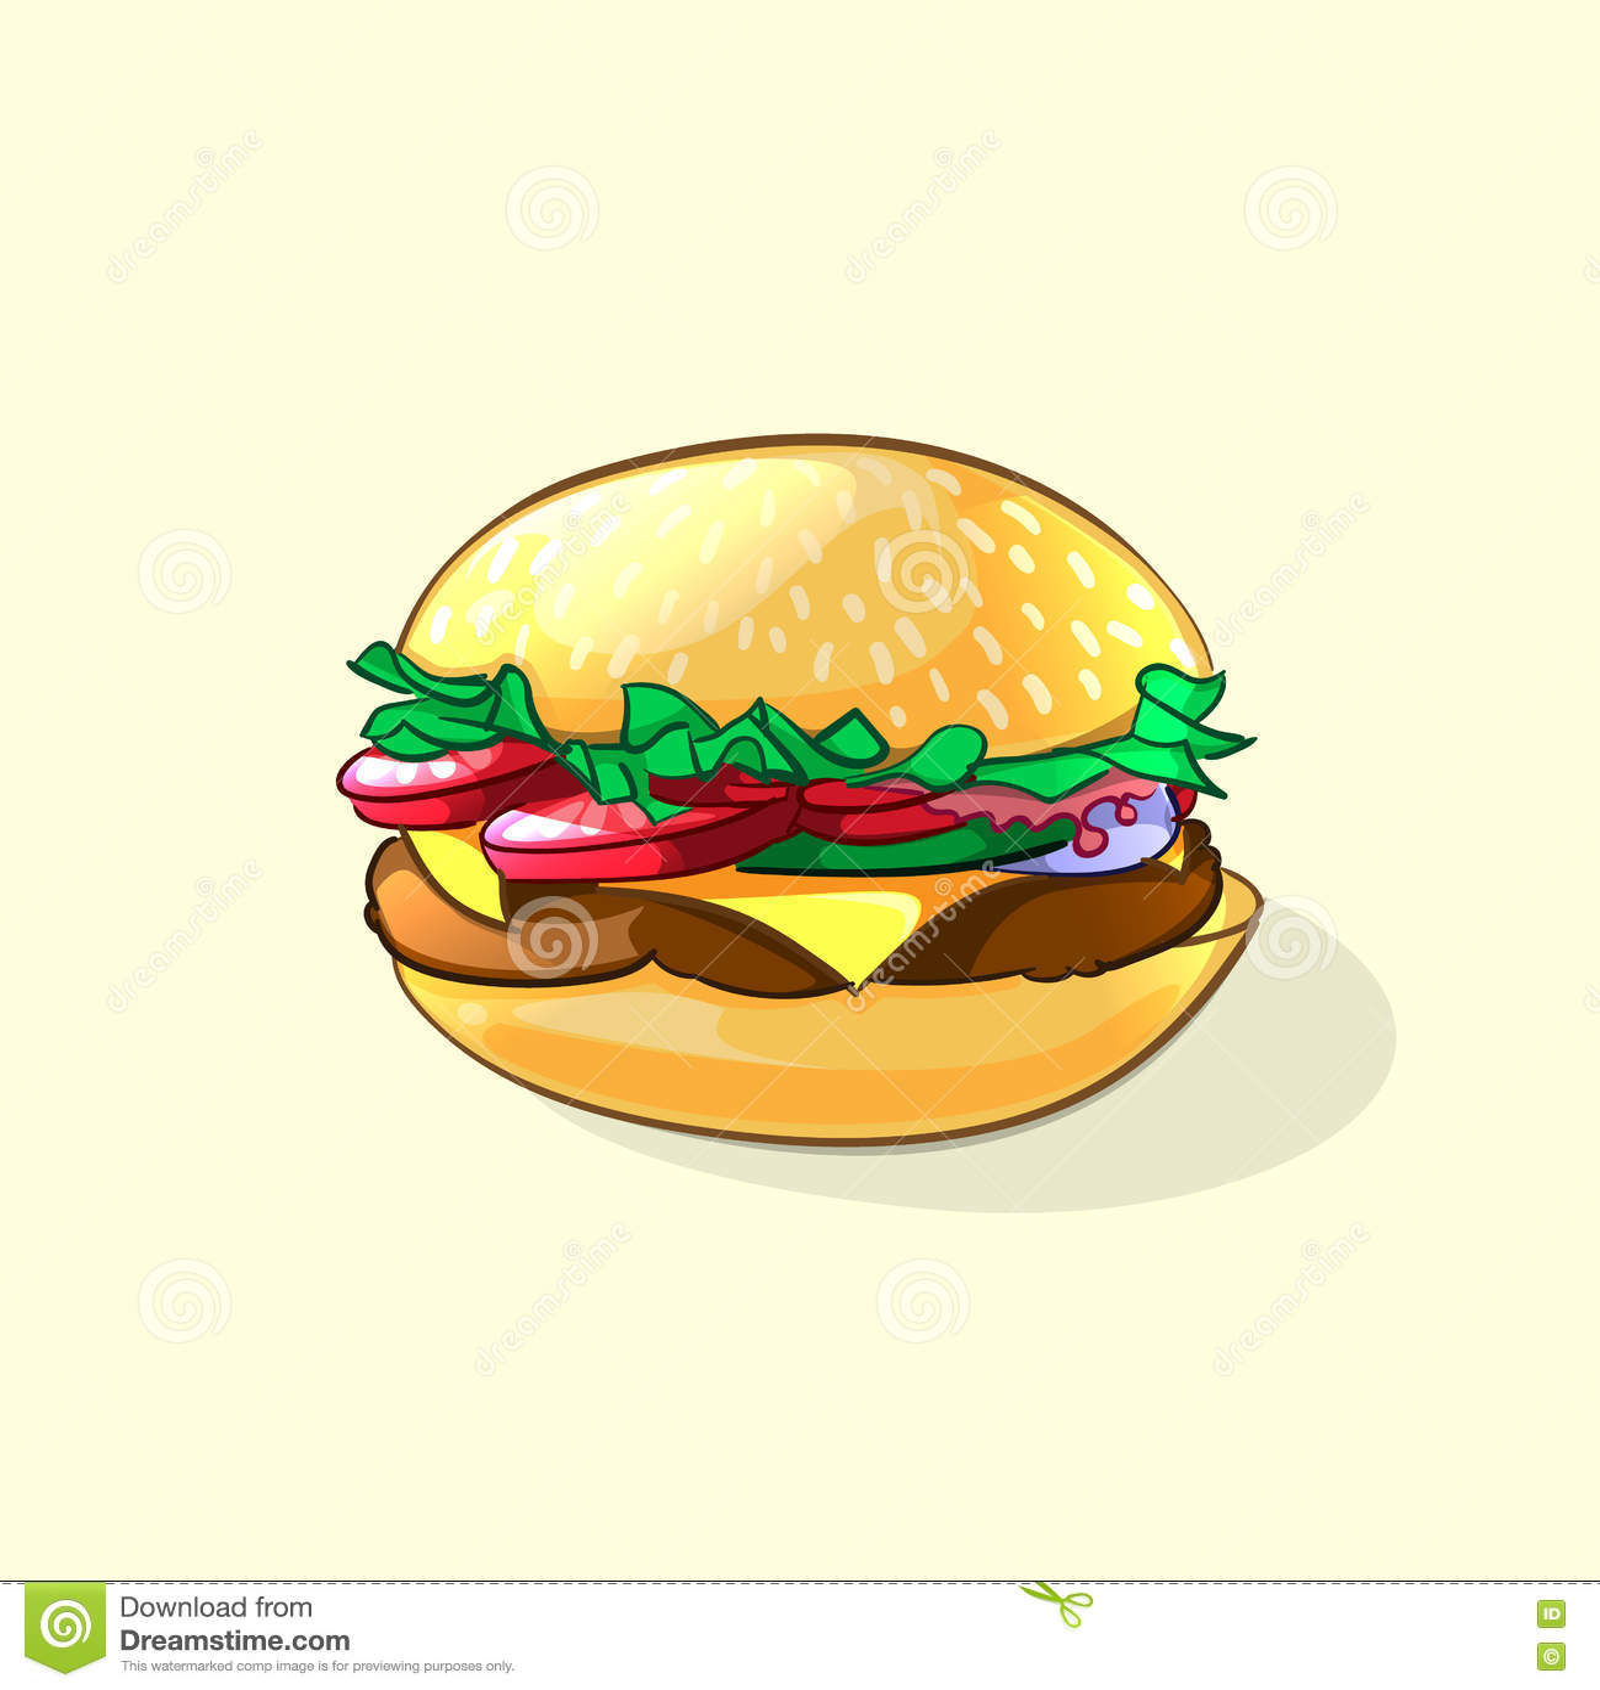 Junk Food Graphic Design